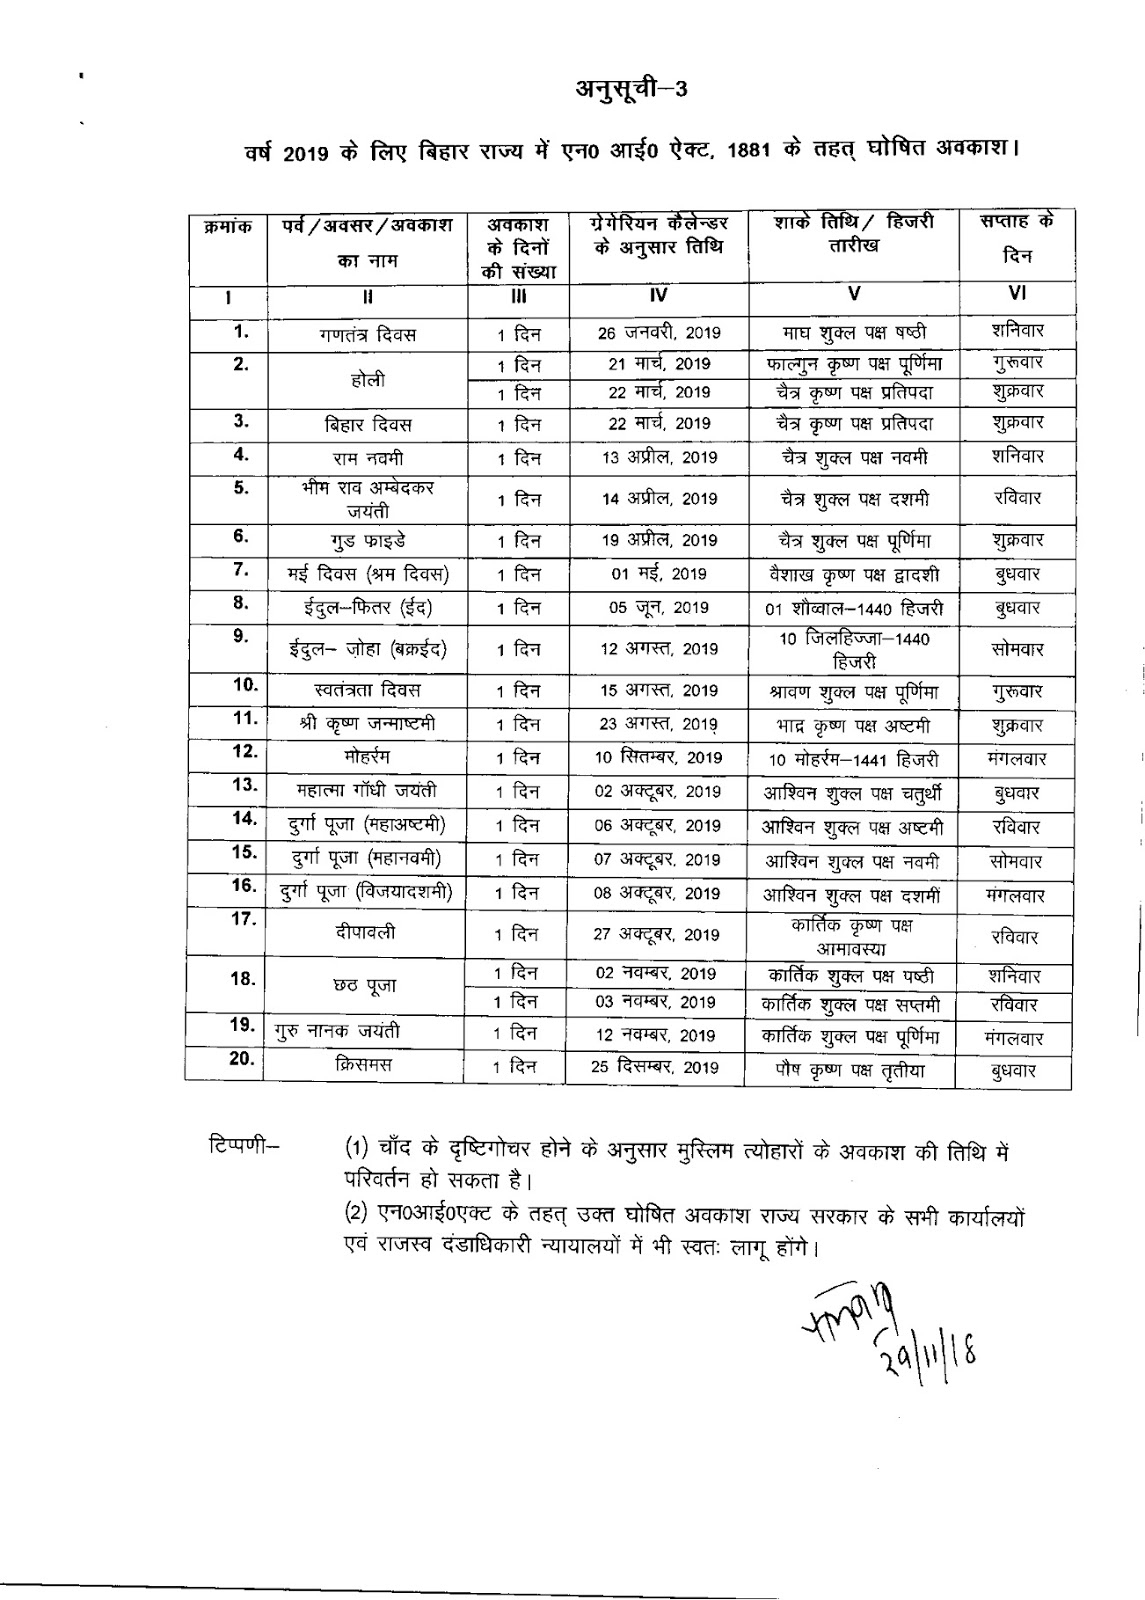 Bihar Government Calendar 2019 #educratsweb for Bihar Sarkar Calender 2020